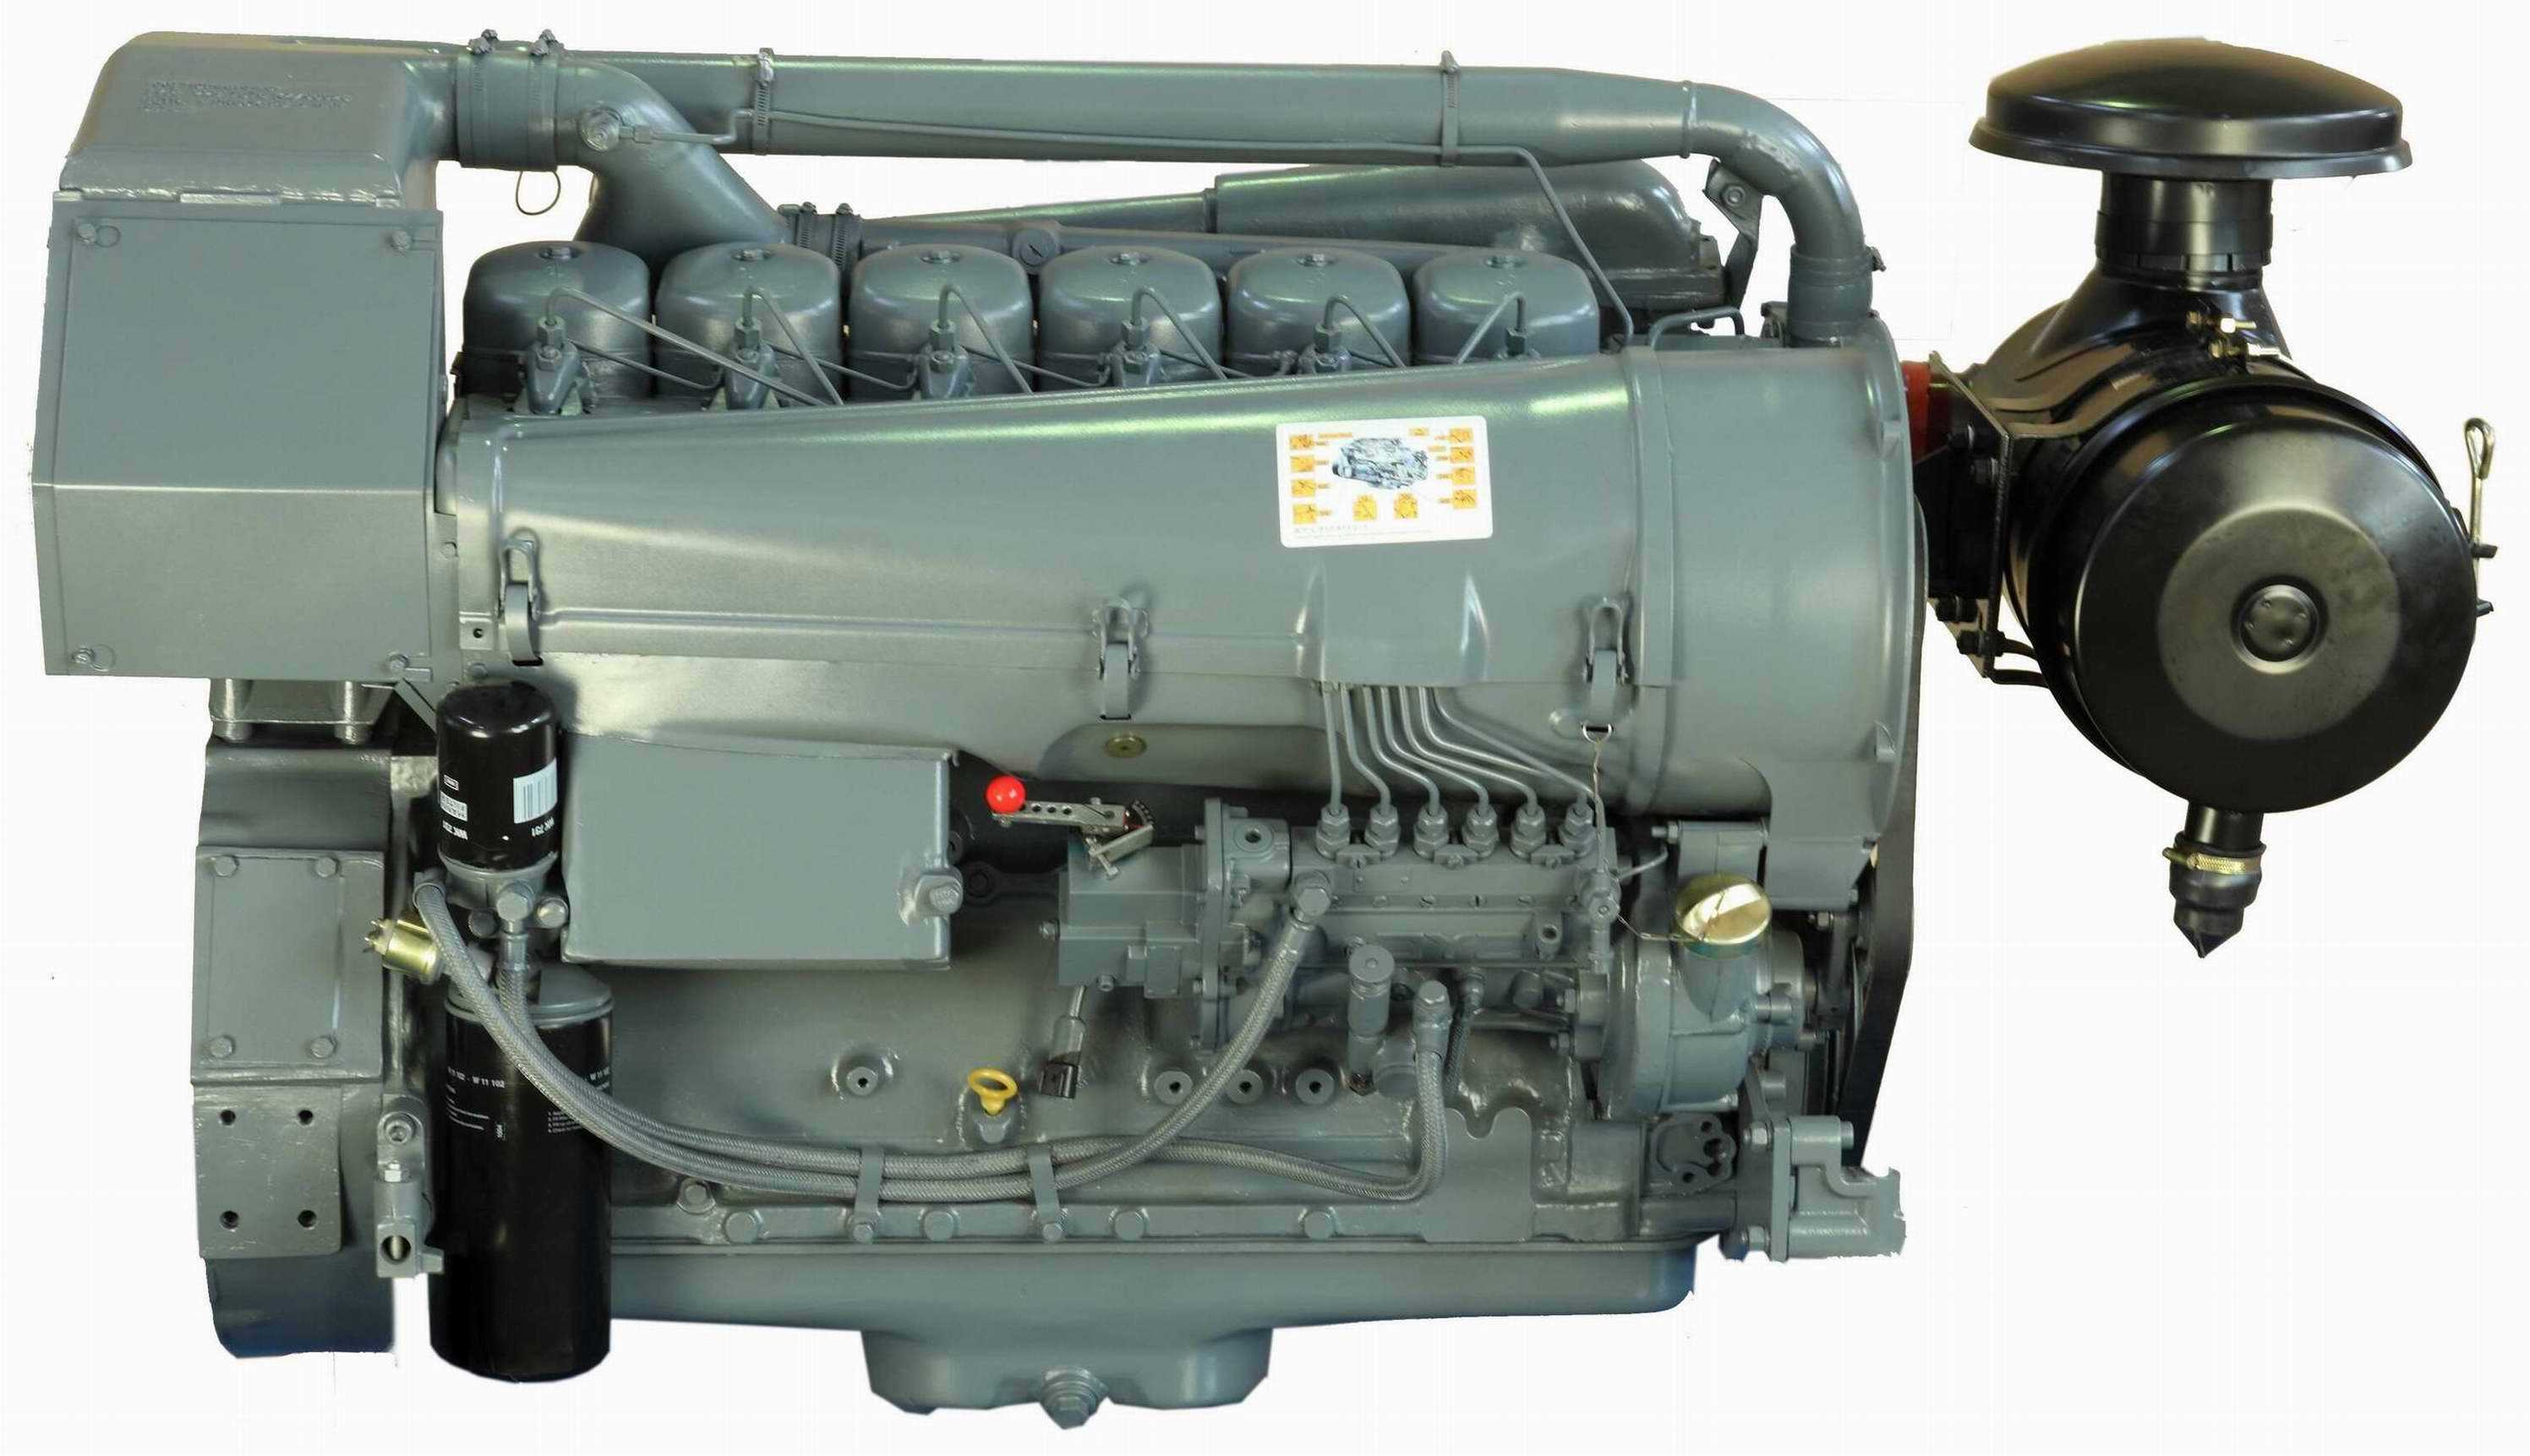 Air Cooled Deutz Diesel Engine (F6L913)